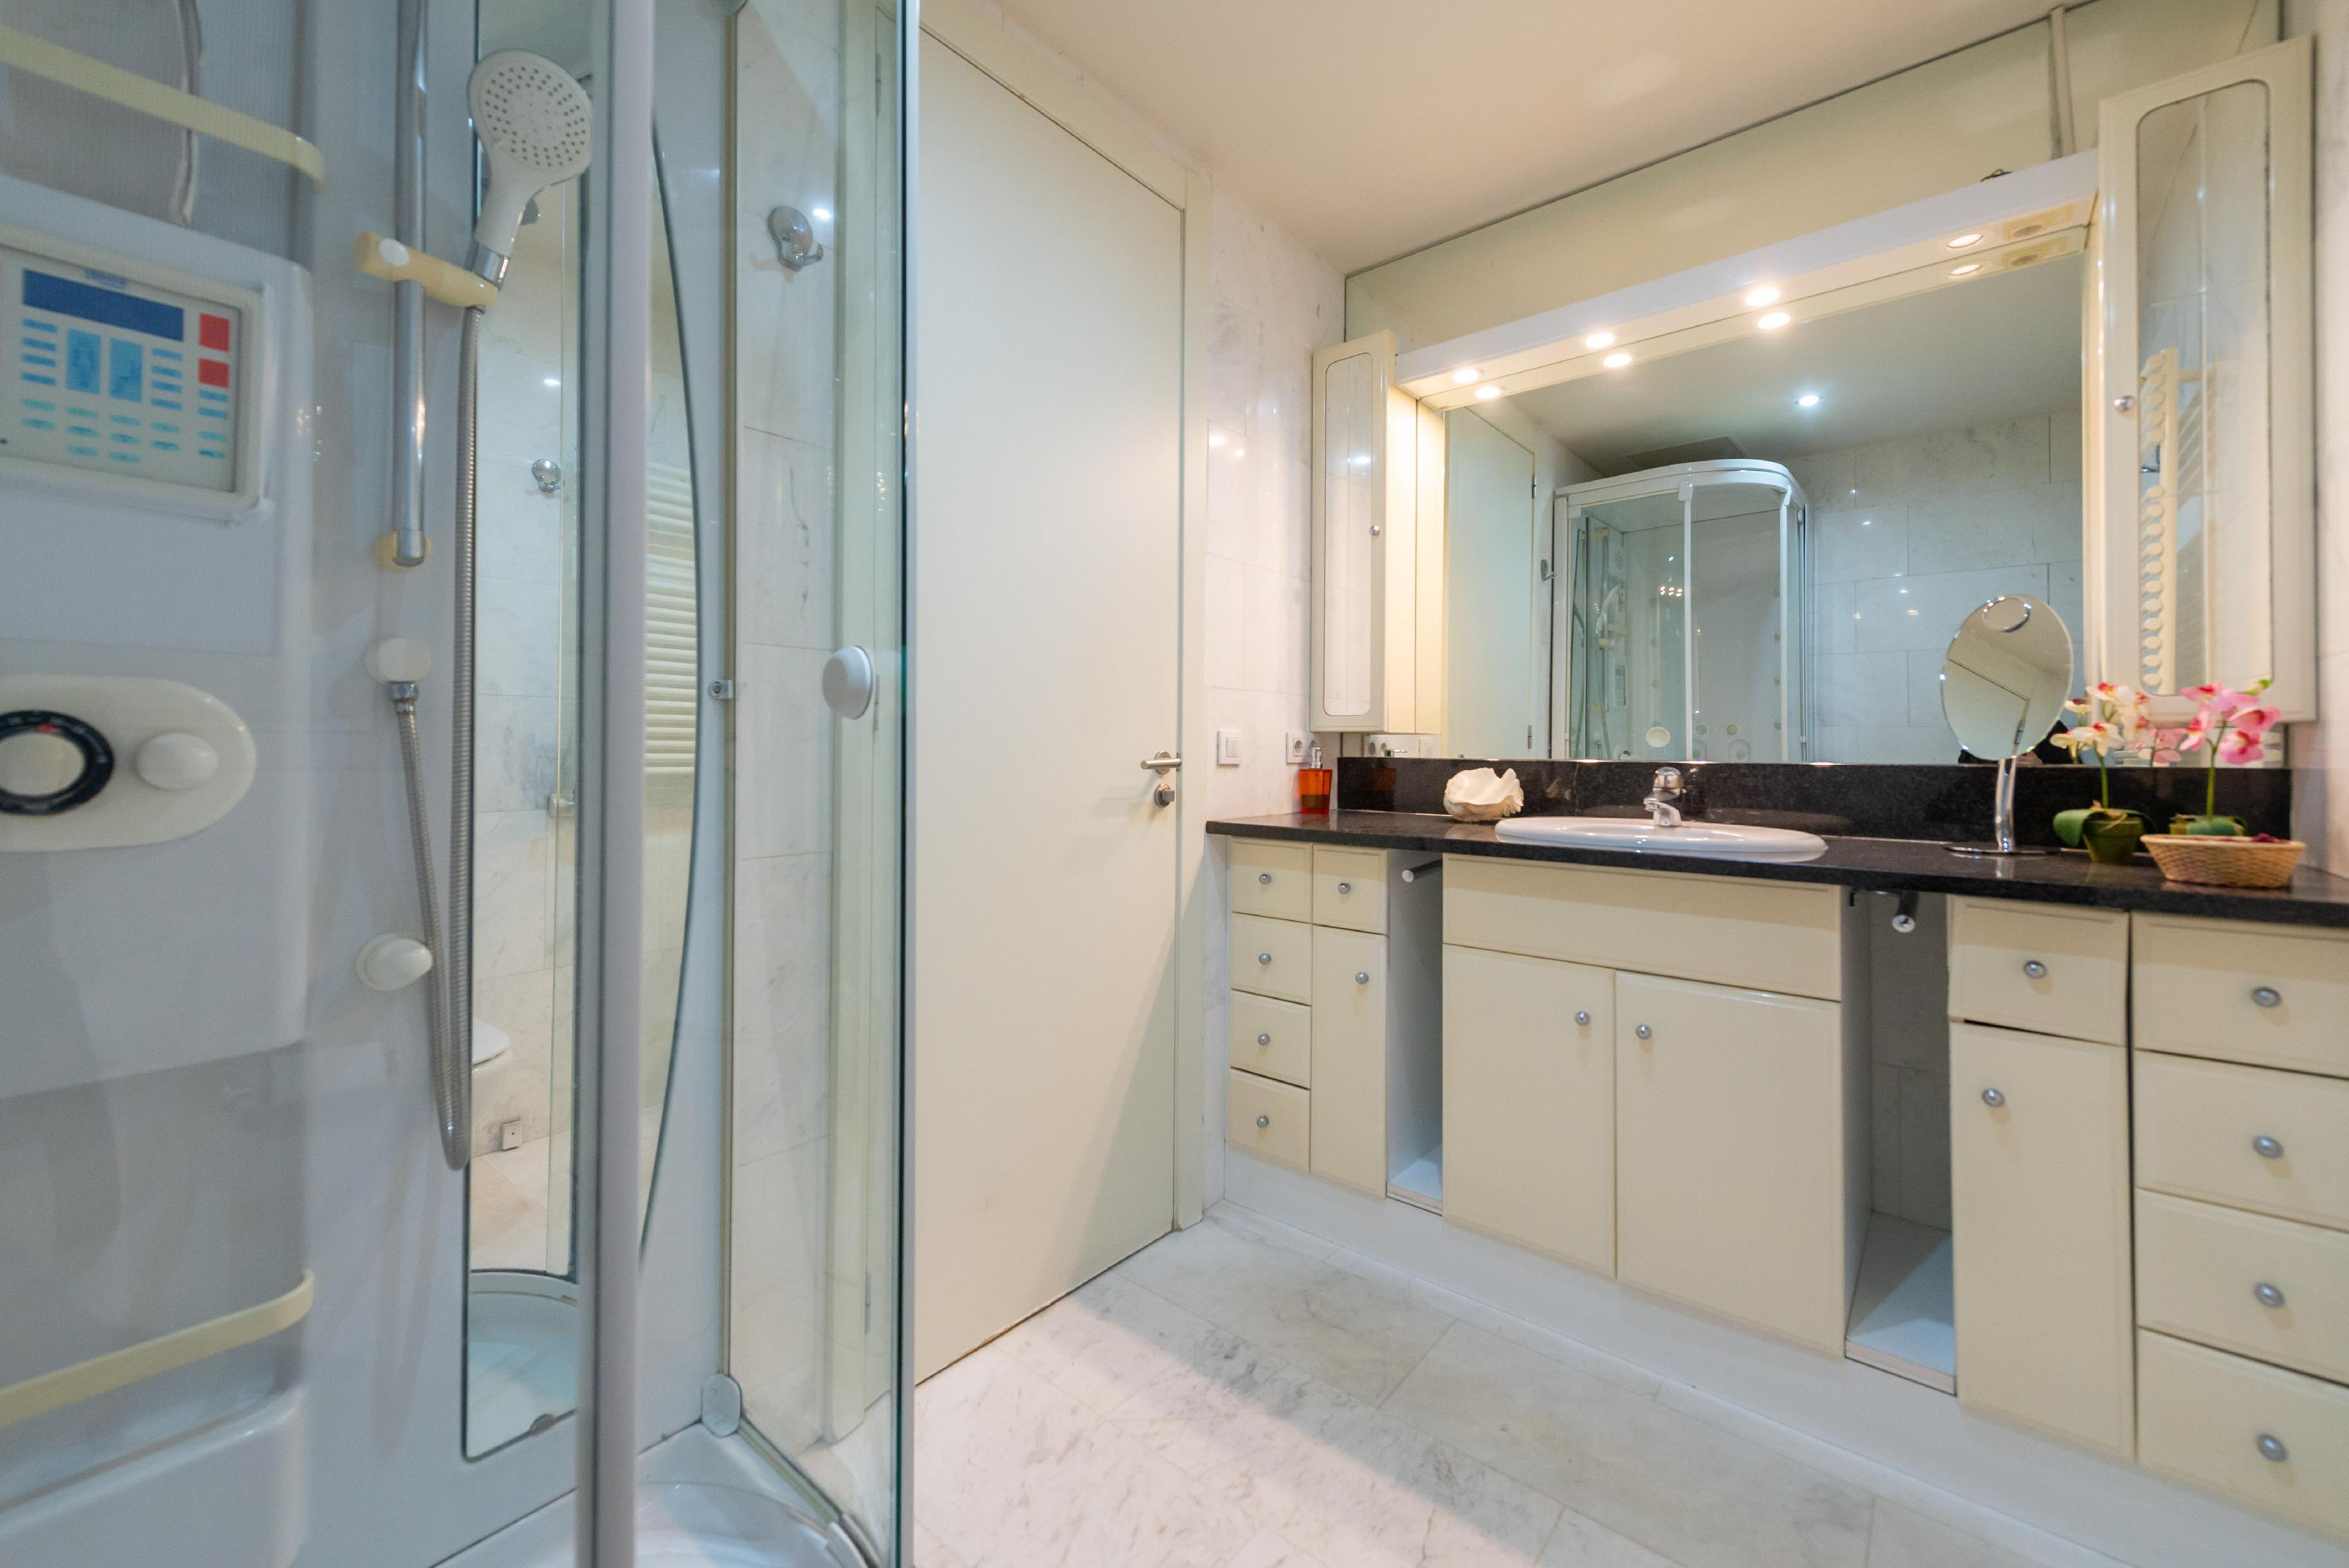 251446 Flat for sale in Sarrià-Sant Gervasi, Tres Torres 29